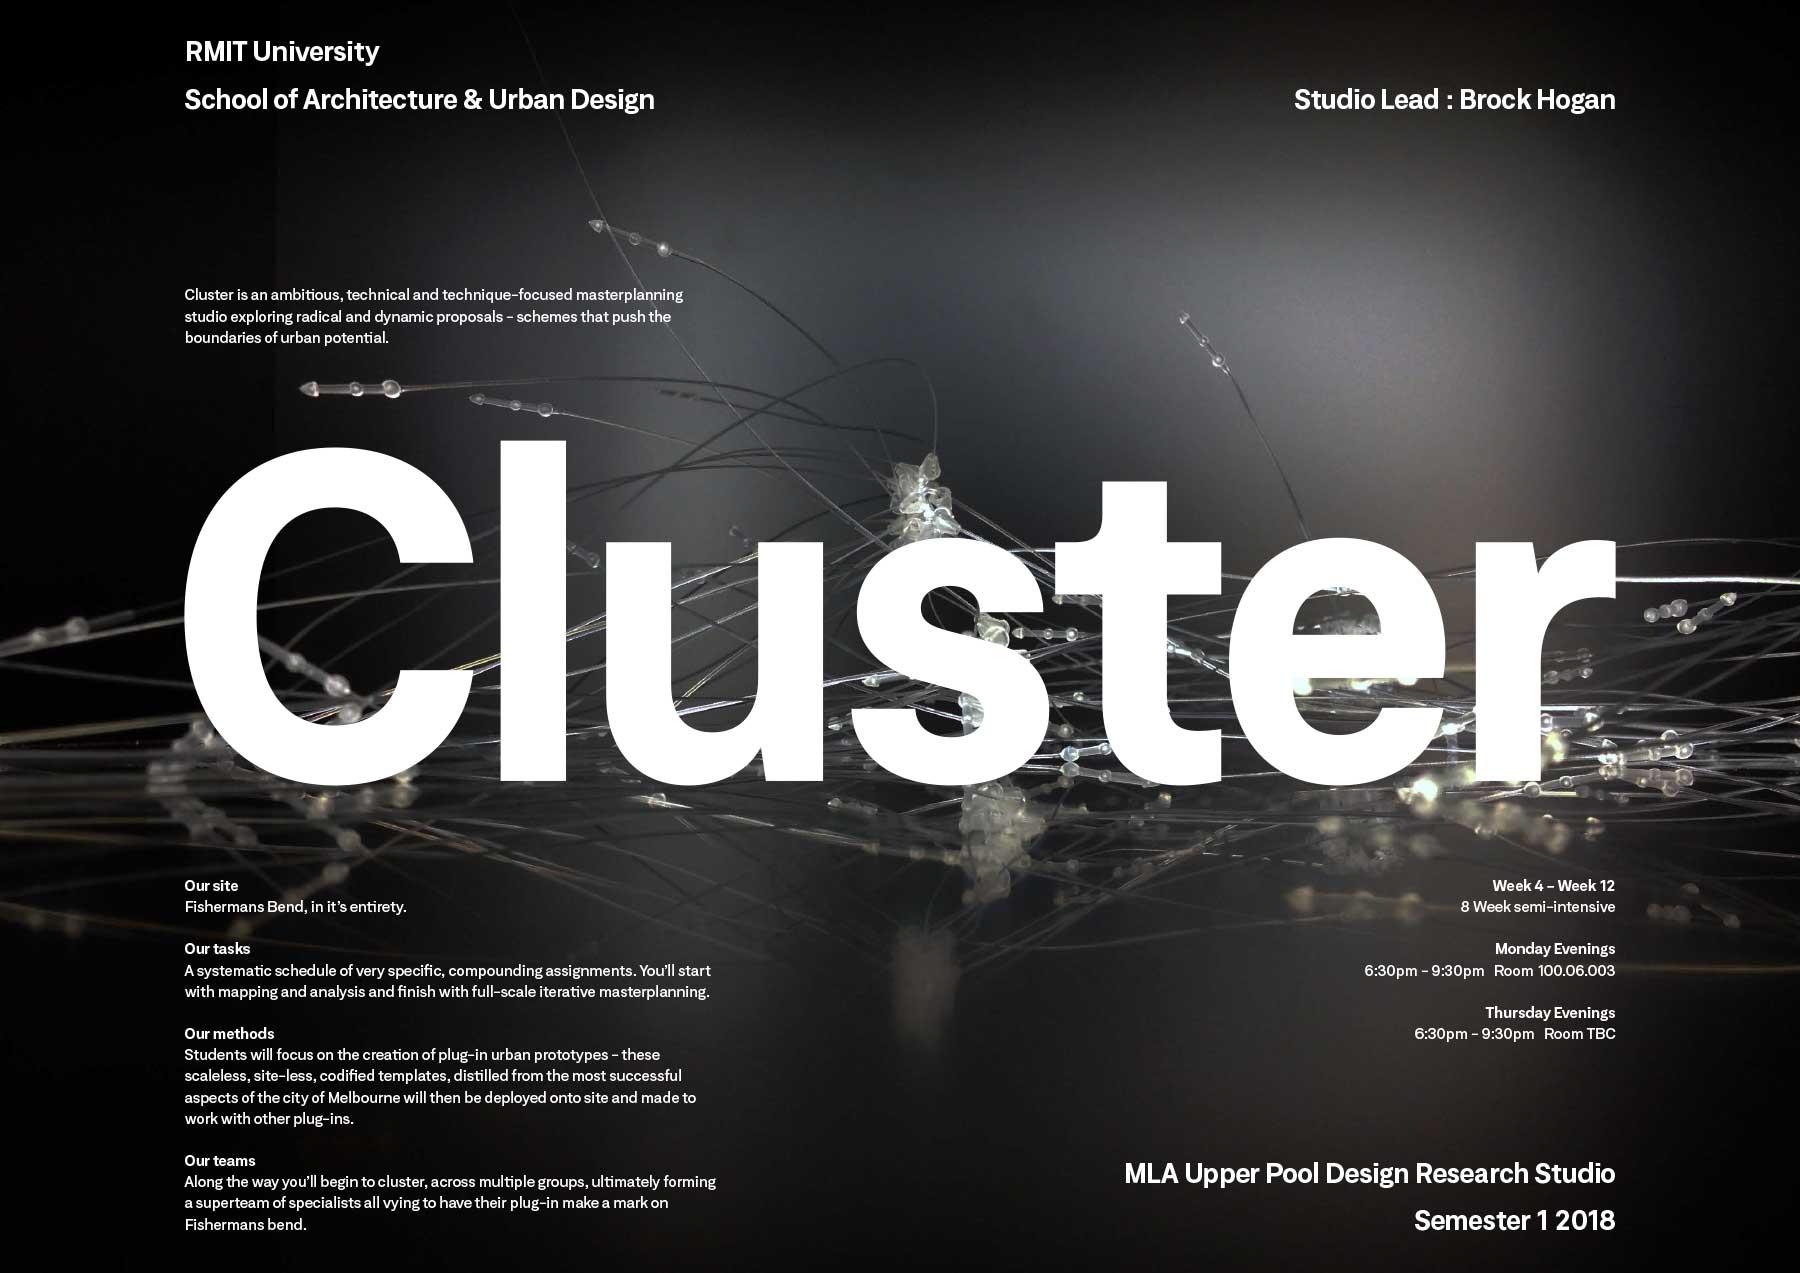 Cluster_BrockHogan_MLA-UPDS_S1-2018_BallotPoster_V1.jpg